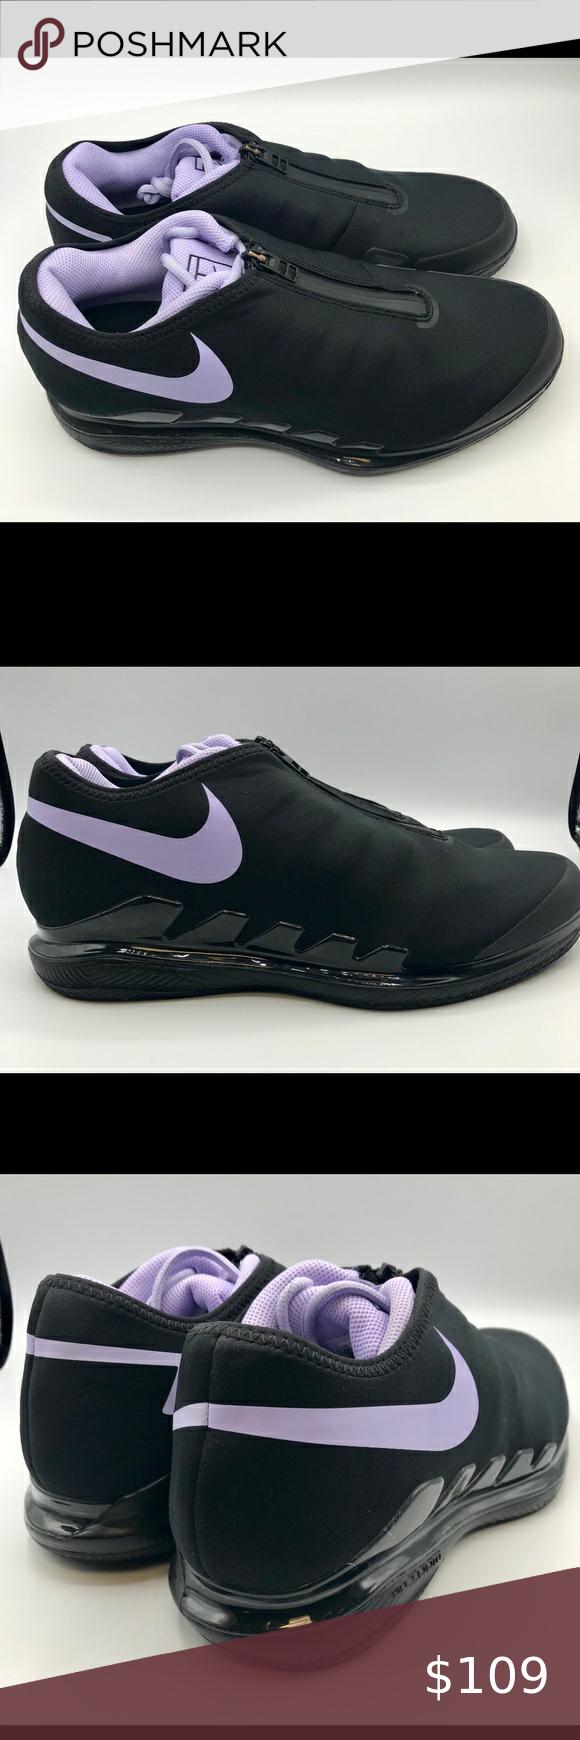 Women S Nike Air Zoom Vapor X Glove Tennis Women S Nike Air Zoom Vapor X Glove Clay Court Tennis Shoes Bq96 In 2020 New Nike Shoes Nike Shoes Outlet Nike Shoes Outfits